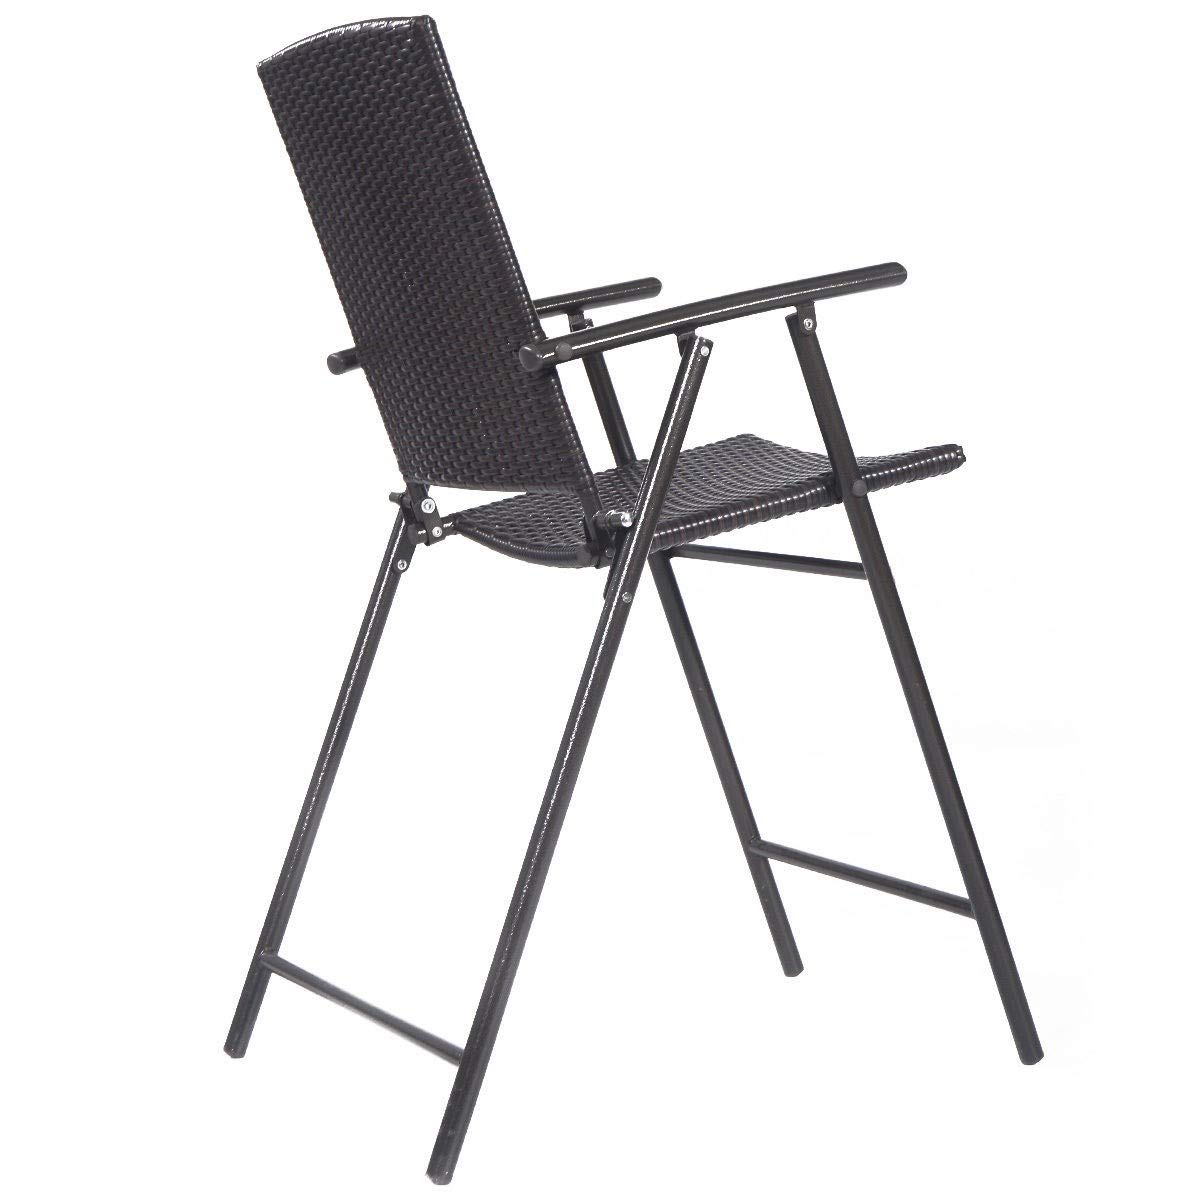 Amazon.com: 4 sillas plegables de mimbre de ratán para ...